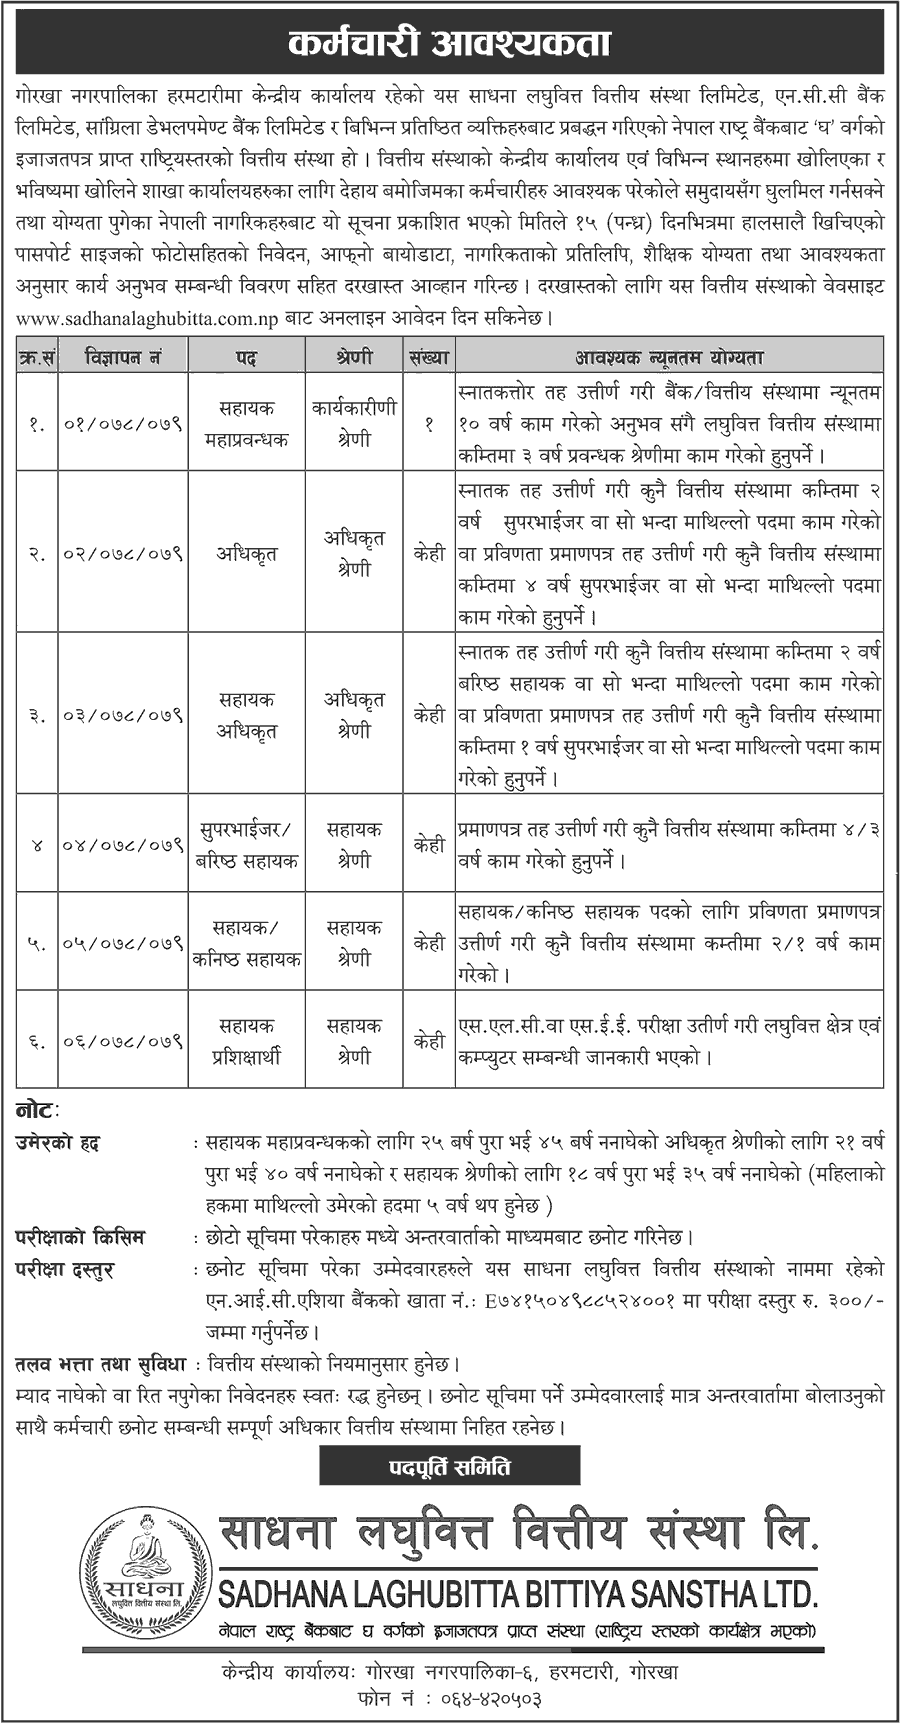 Sadhana-Laghubitta-Bittiya-Sanstha-Limited-Announces-Job-Vacancy-for-Various-Positions